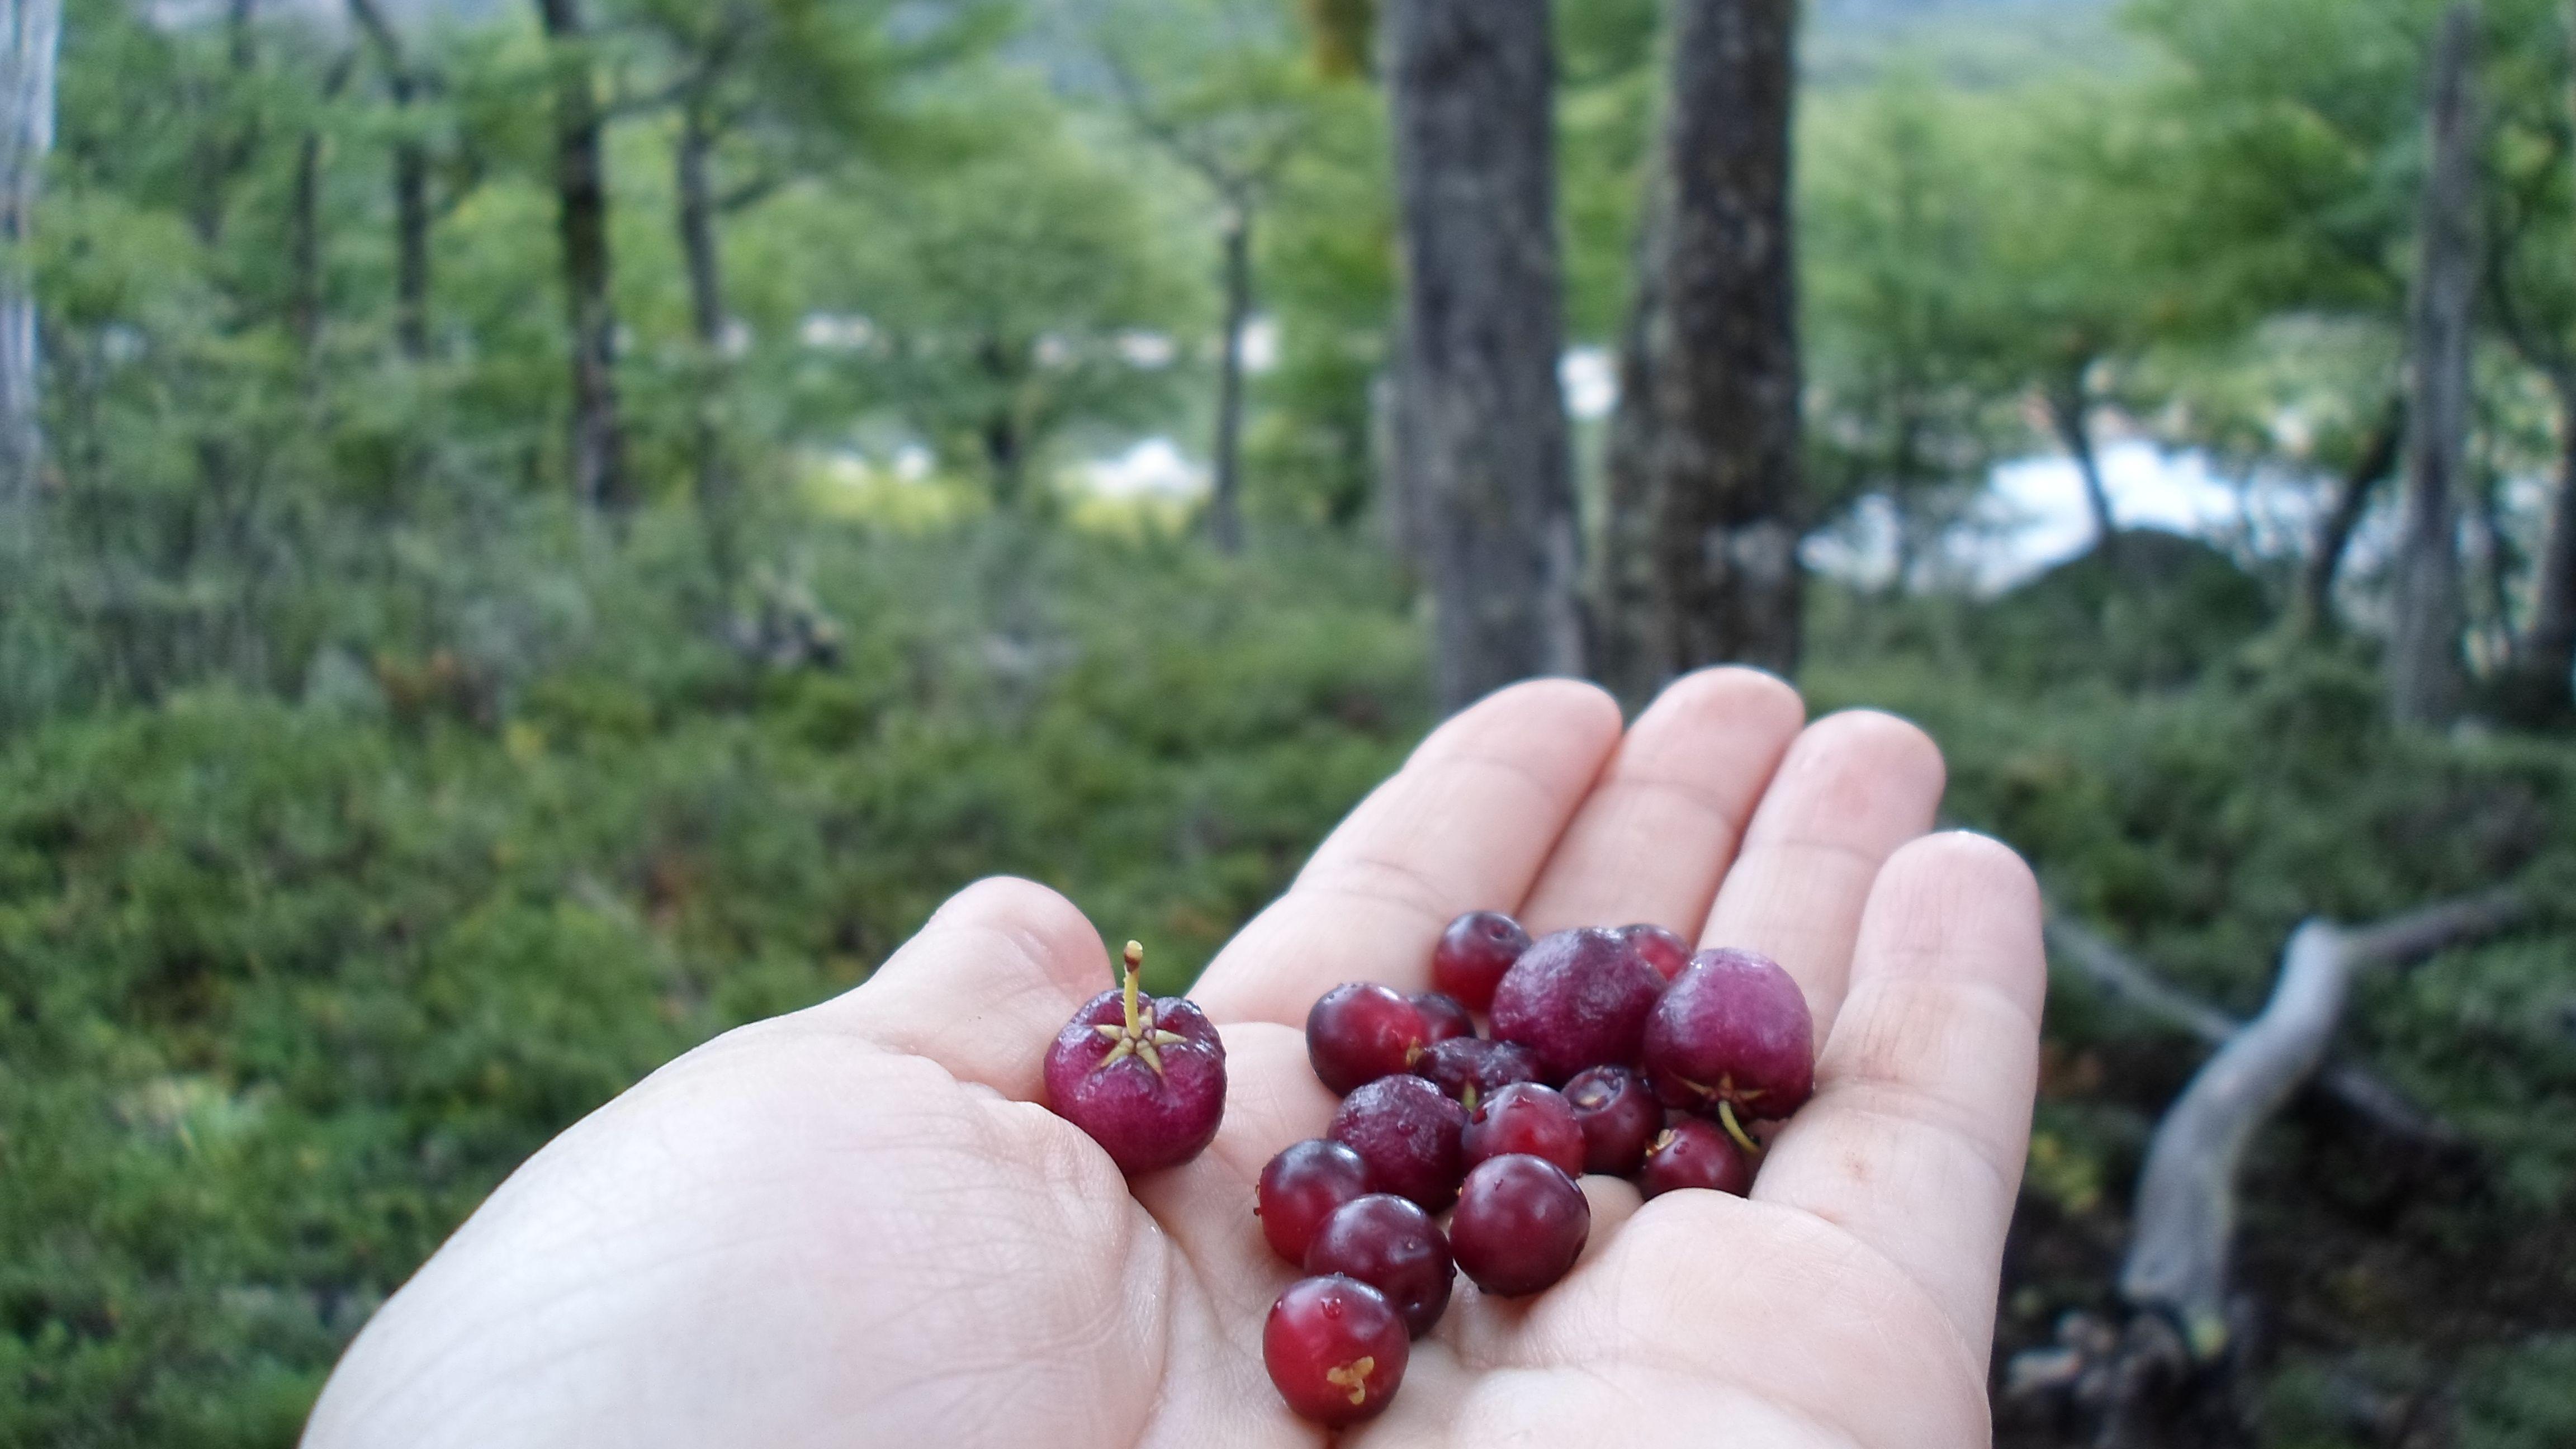 Motillas Wild berries - Santa Cruz Patagonia Argentina